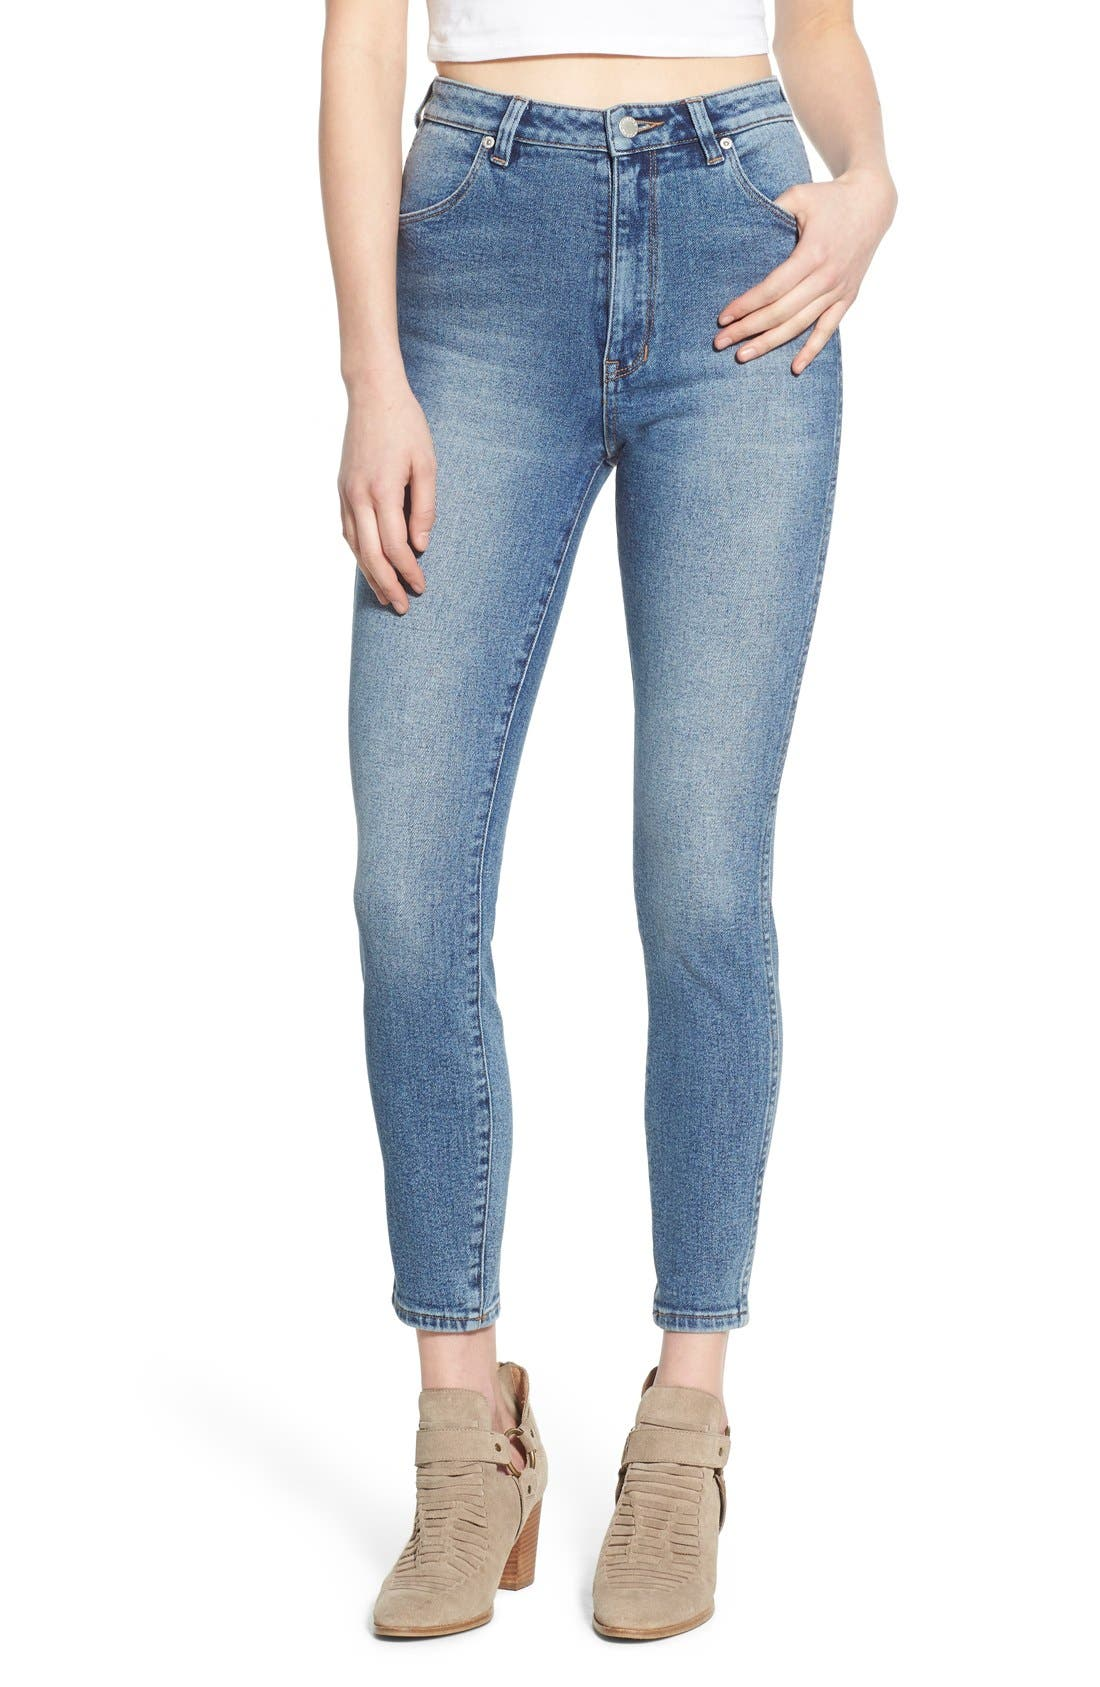 Alternate Image 1 Selected - Rolla's 'East Coast' High Rise Ankle Skinny Jeans (Folk Blue)